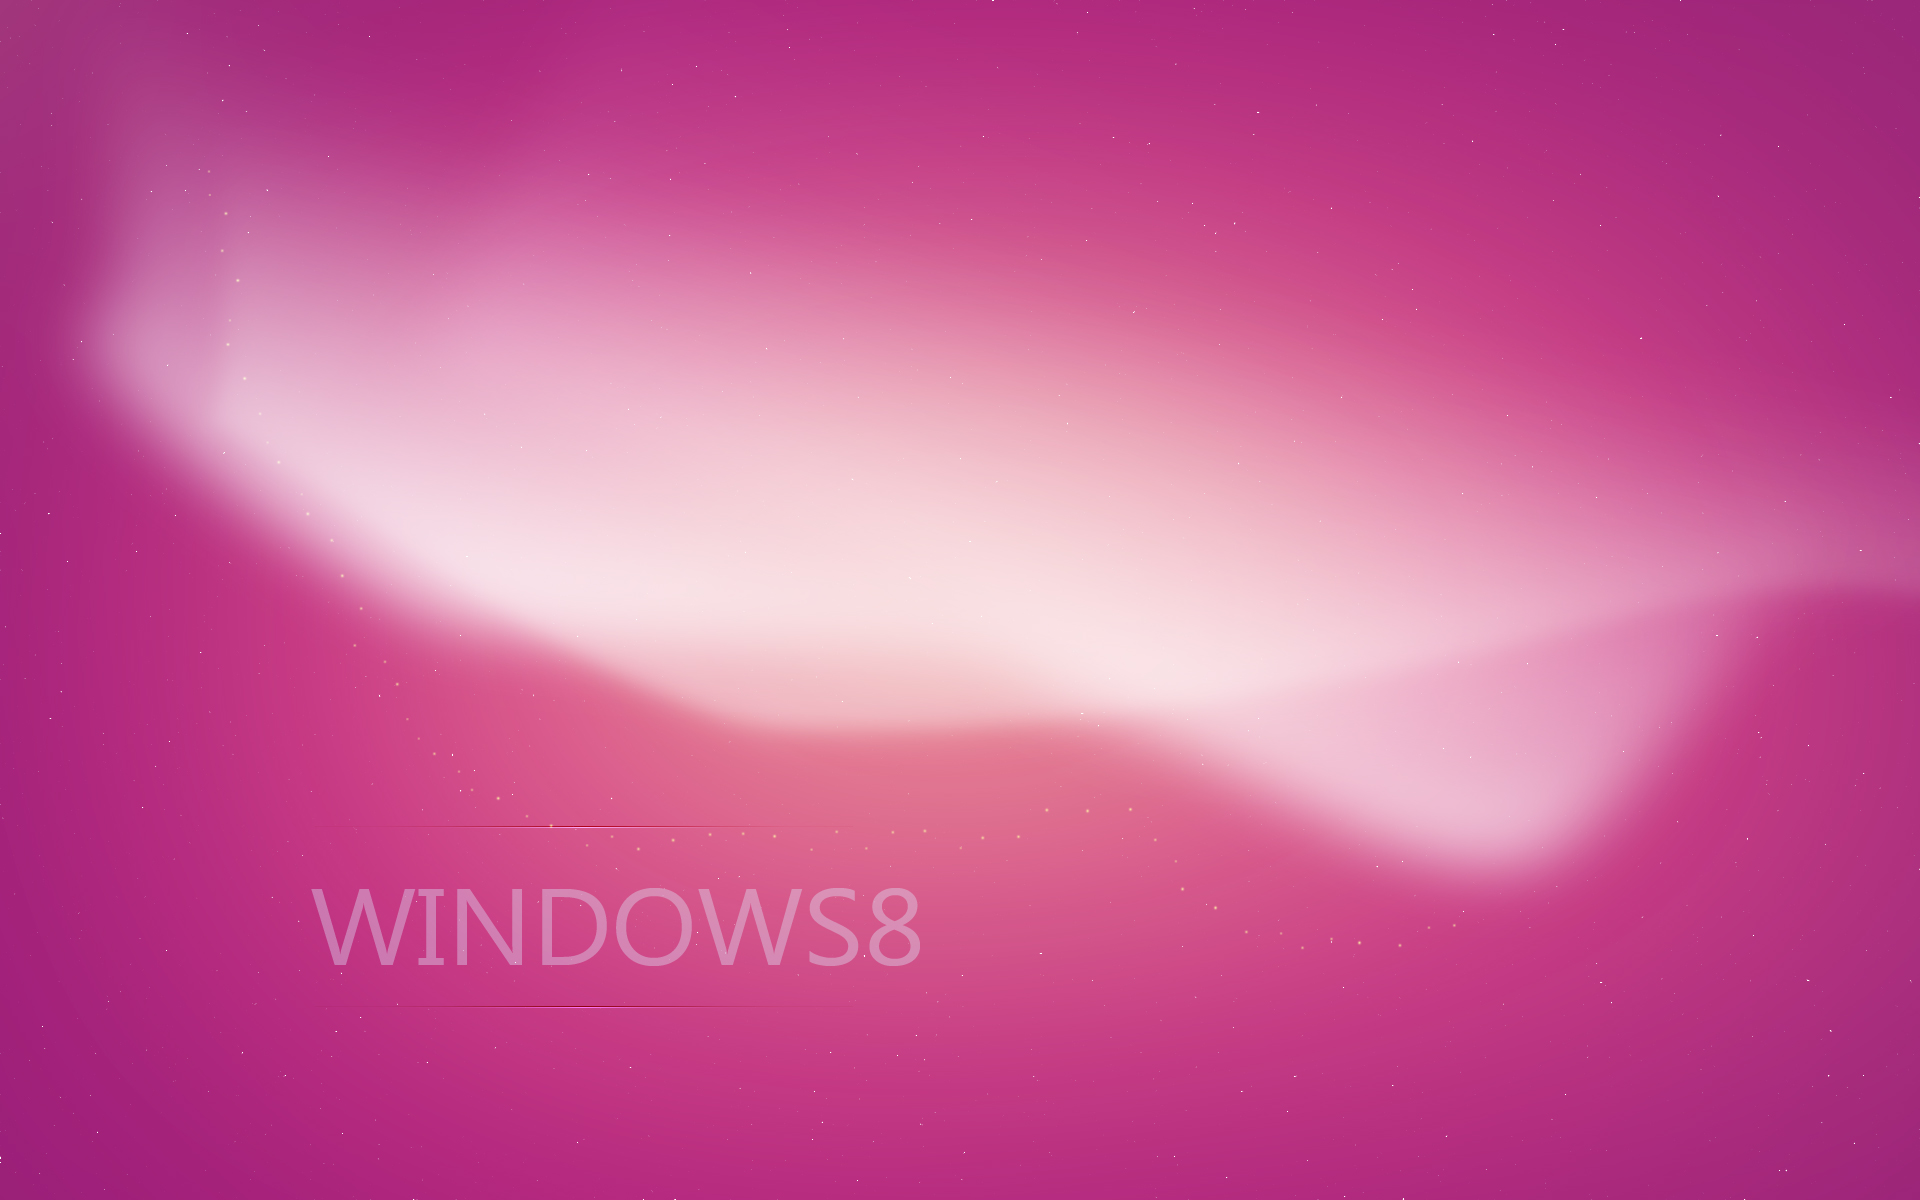 windows8 wallpaper